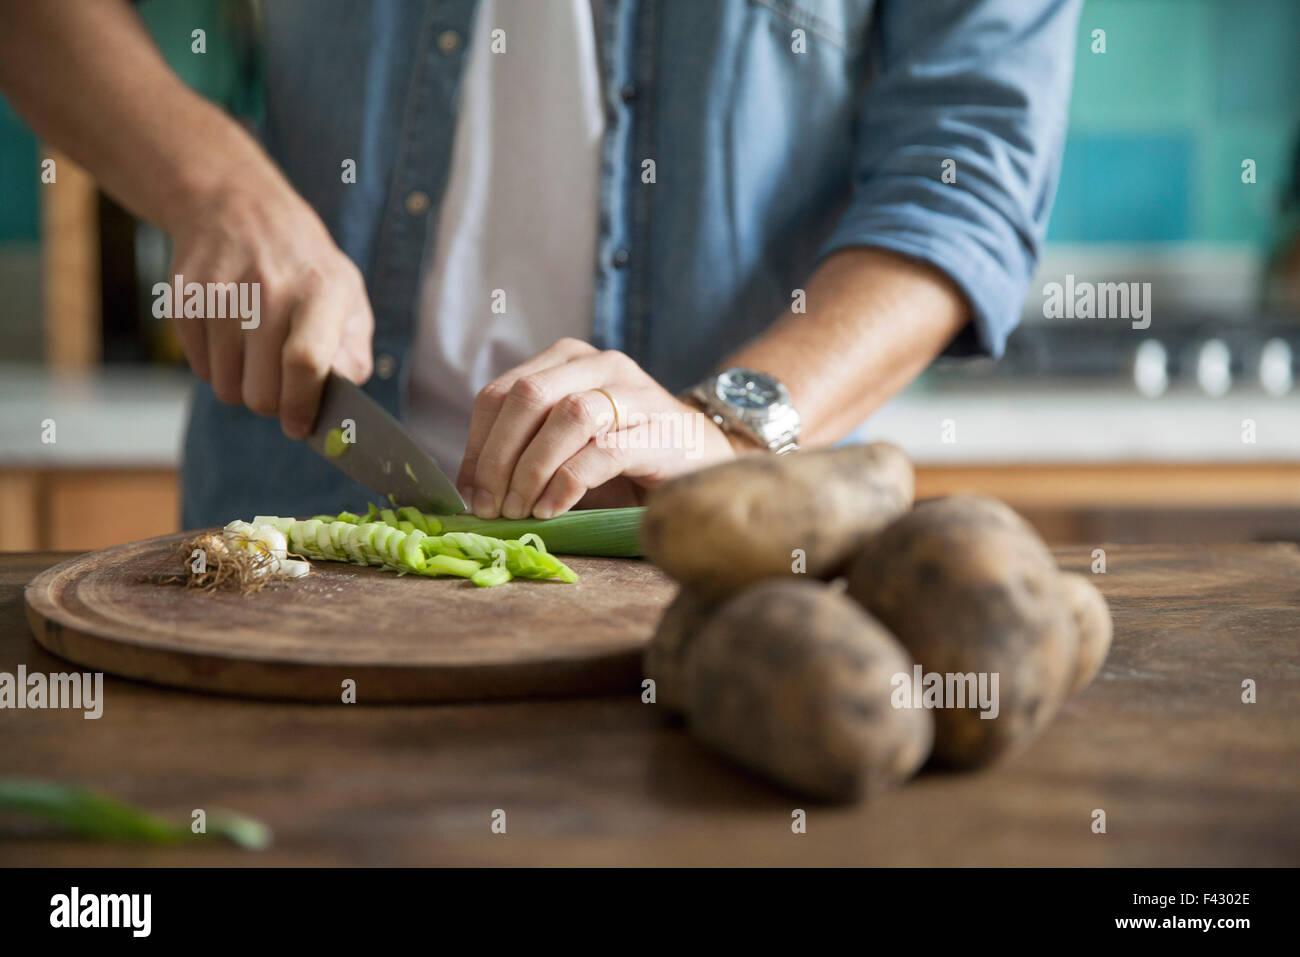 Mann schneiden Frühlingszwiebeln in Küche Stockbild